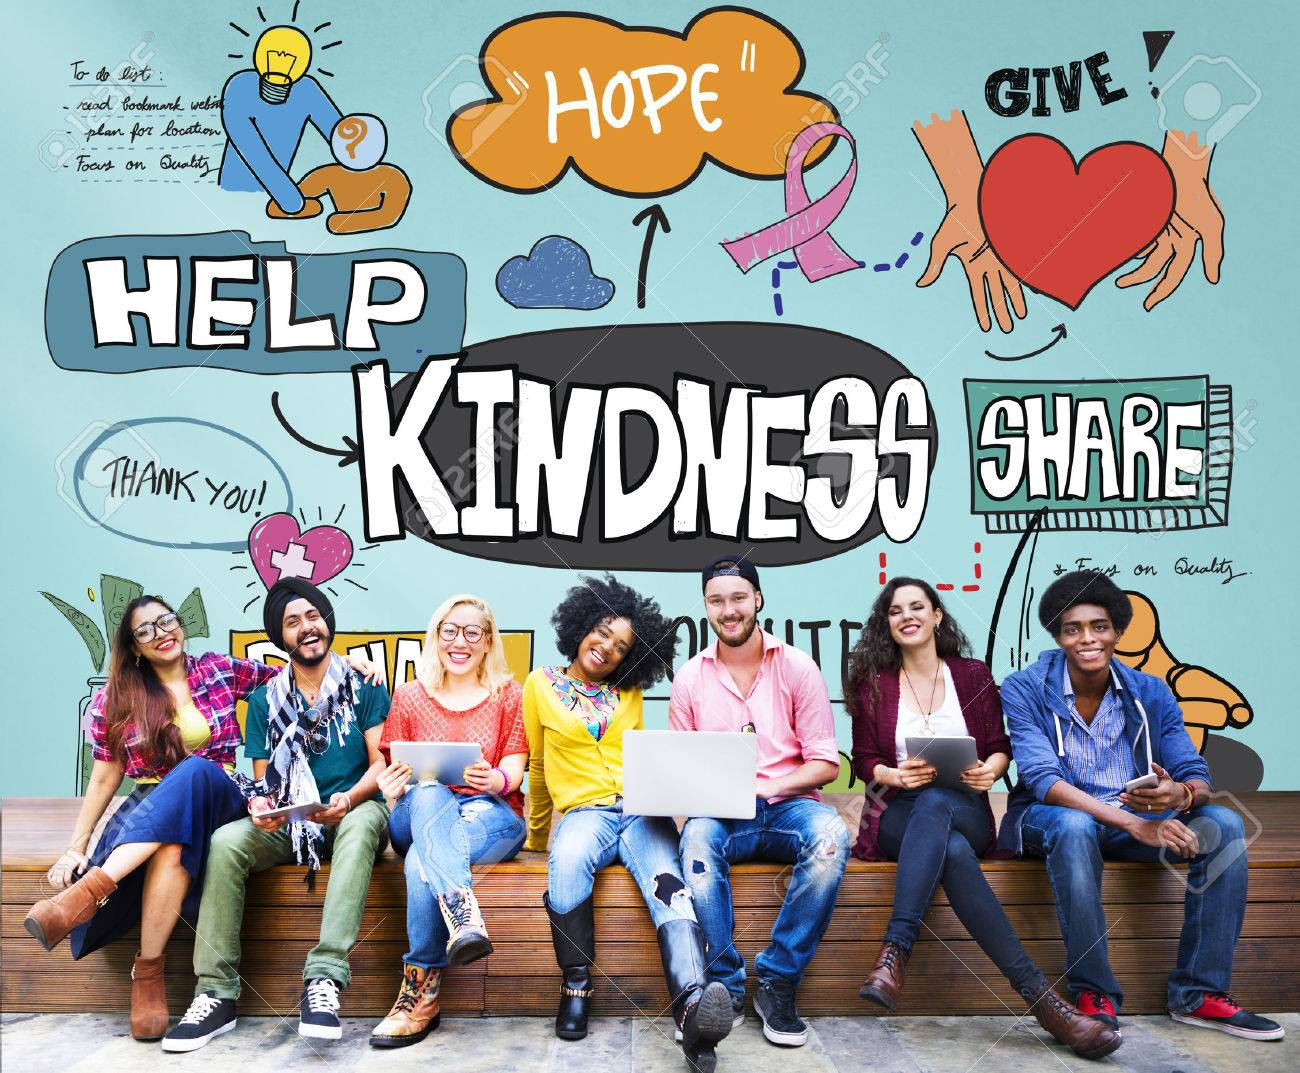 Kindness Kindly Optimistic Positive Giving Concept - 53962807